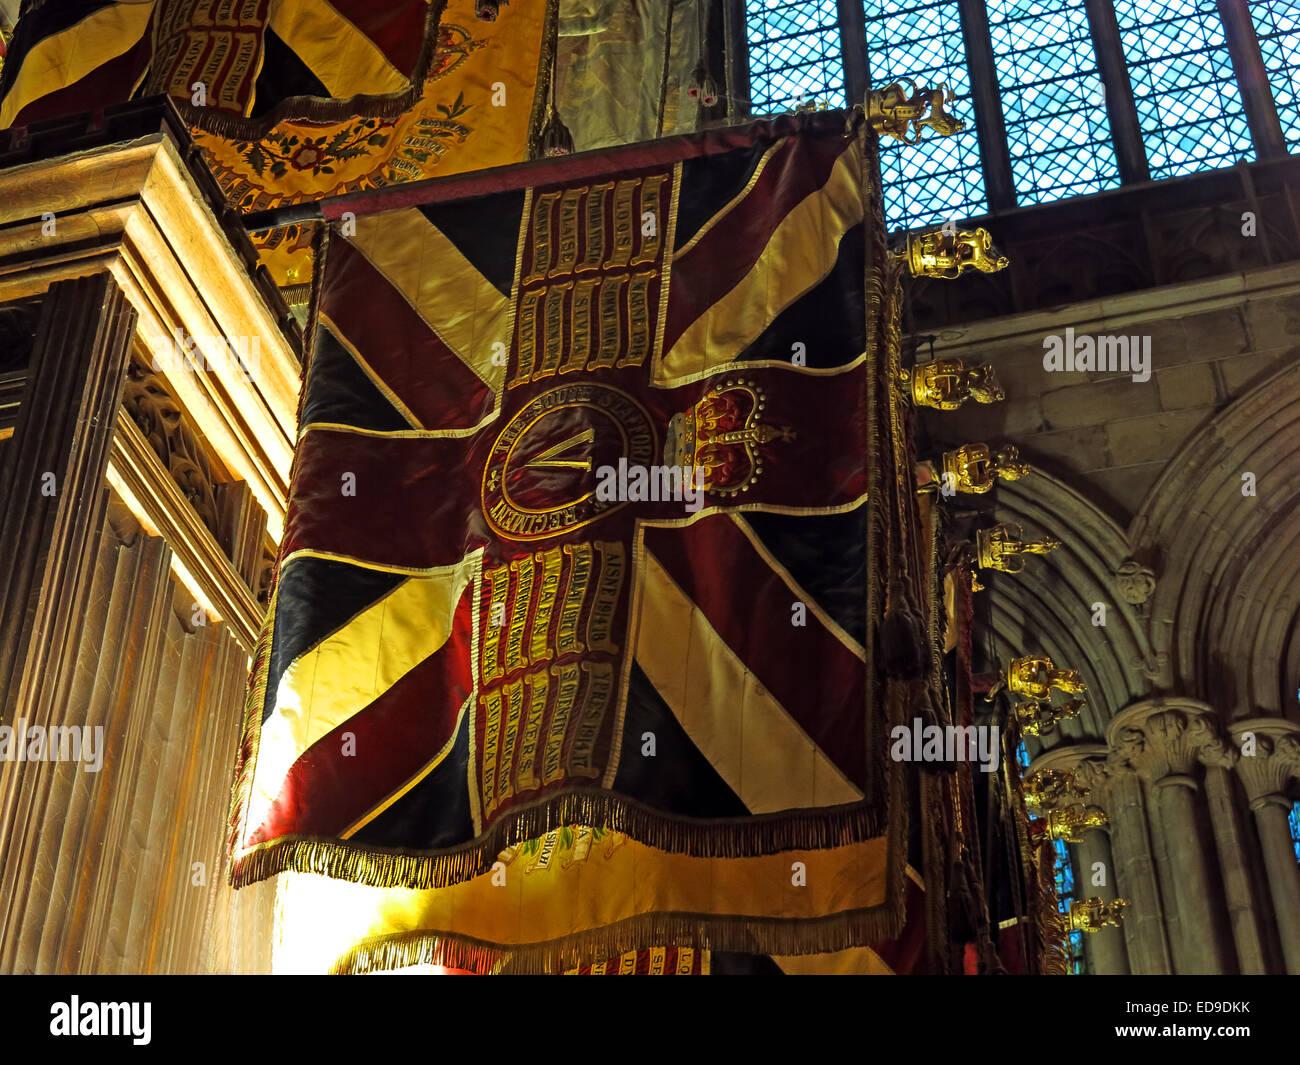 at dusk,England,UK,medieval,English,stone,history,historic,Diocese,of,inside,Sandstone,chad,st,Mary,bishop,Gotonysmith